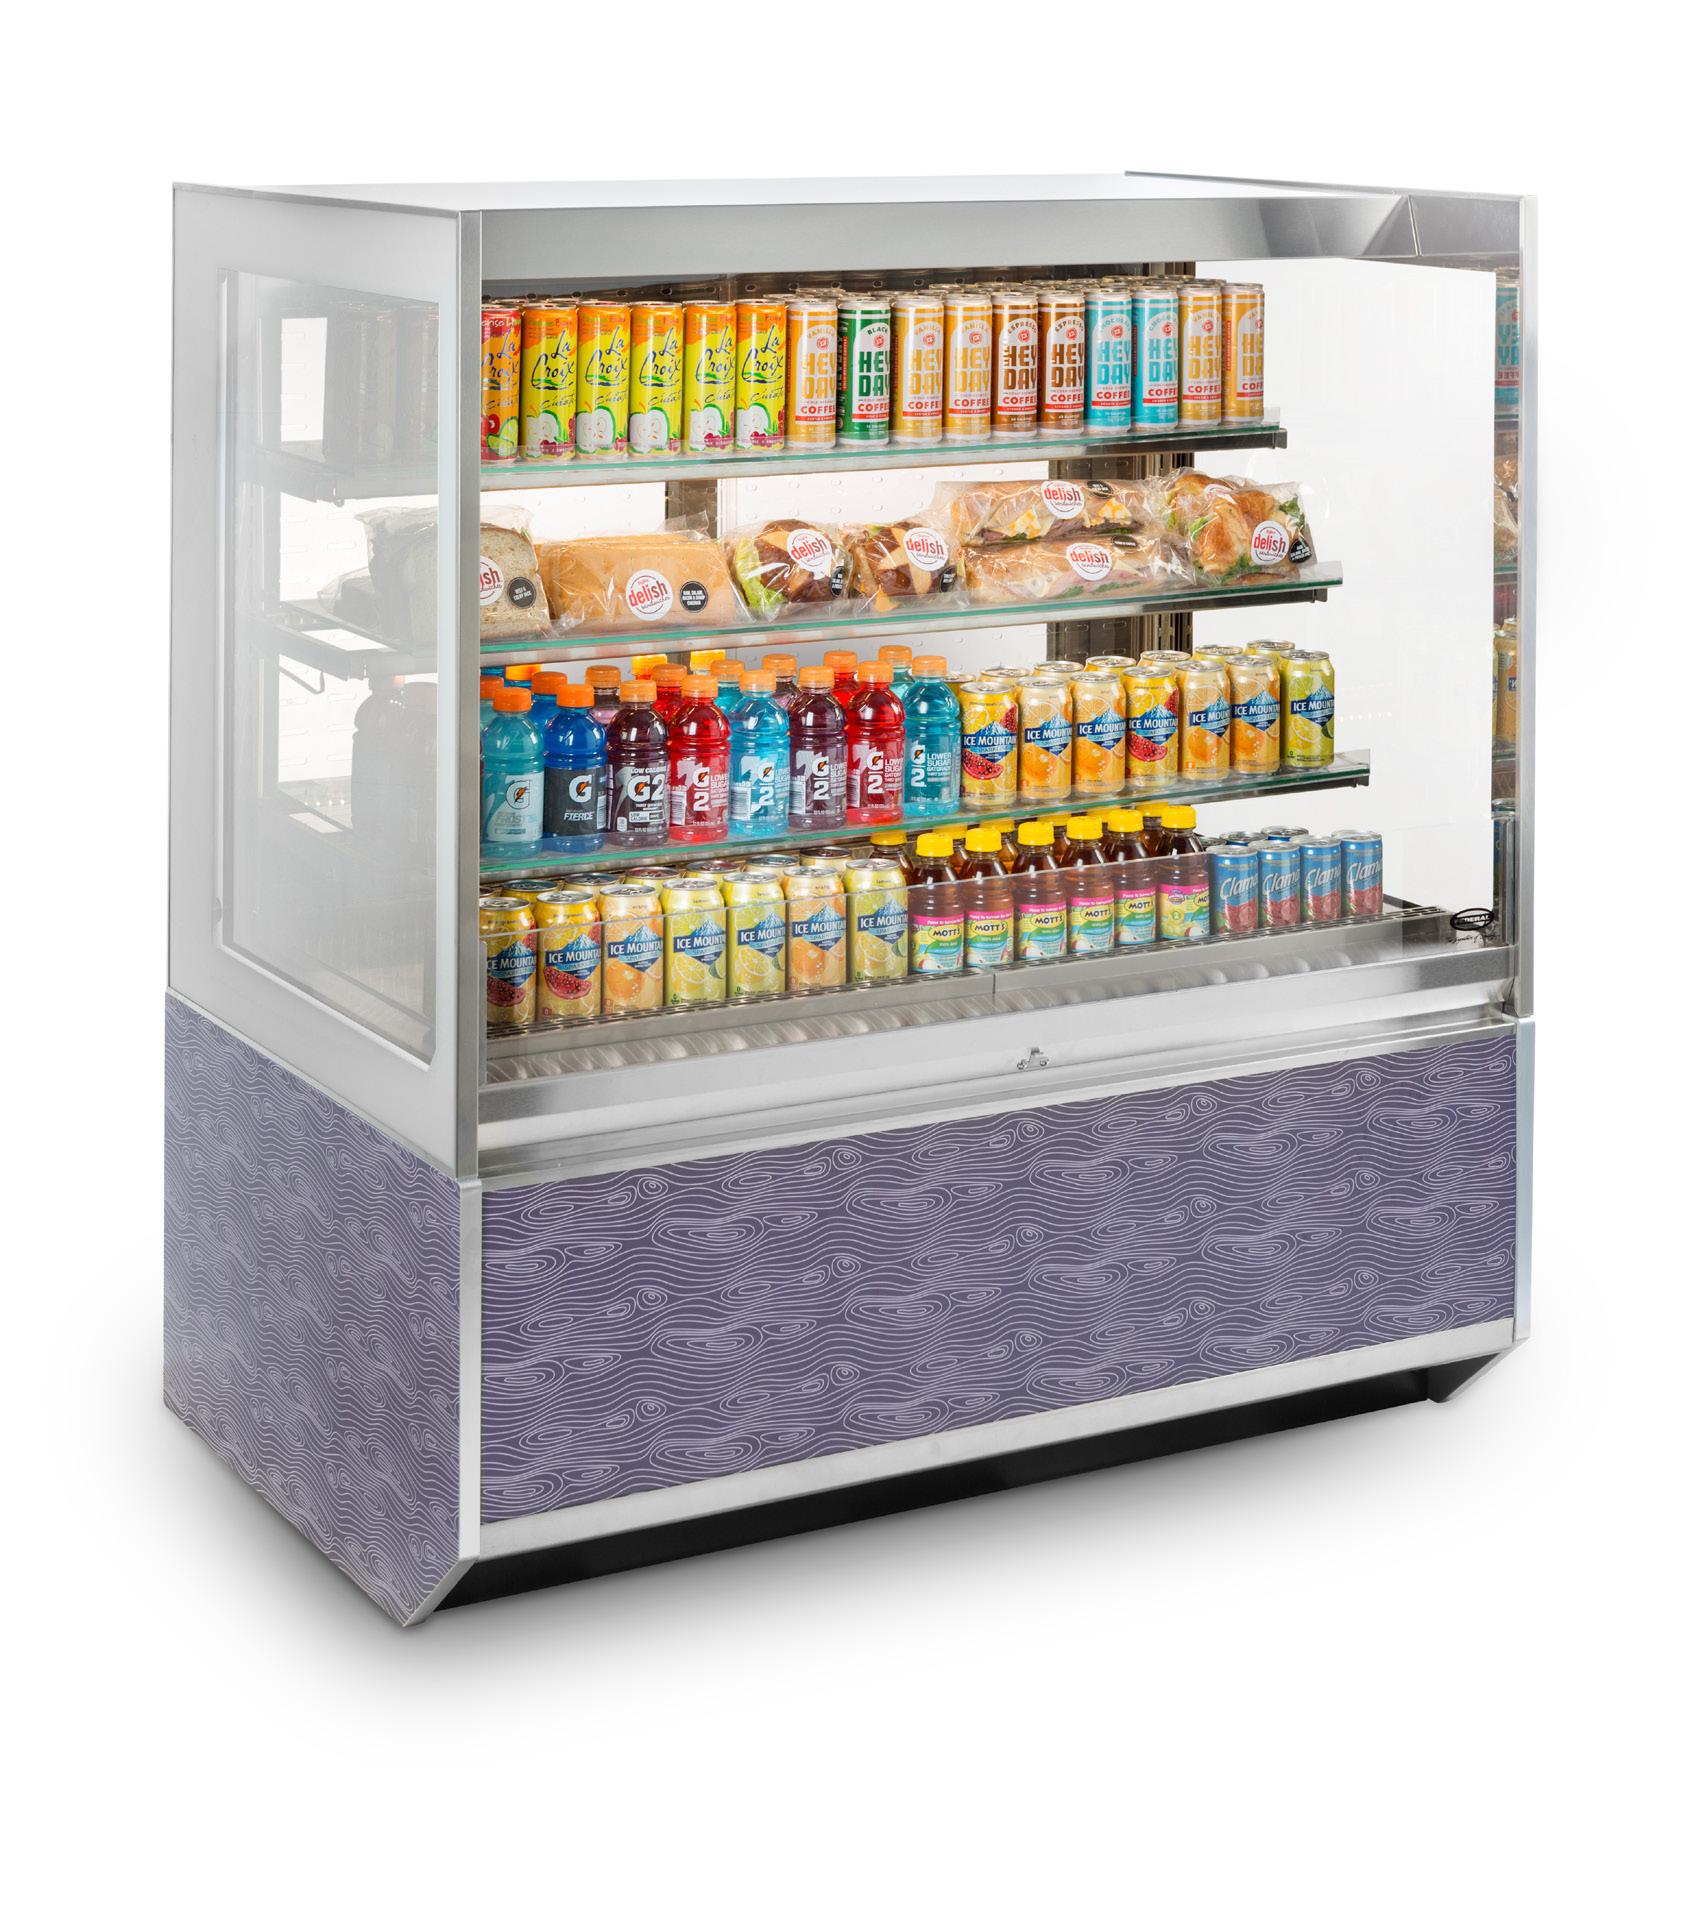 ITRSS3626-B18 Italian Glass Refrigerated Self-Serve Merchandiser